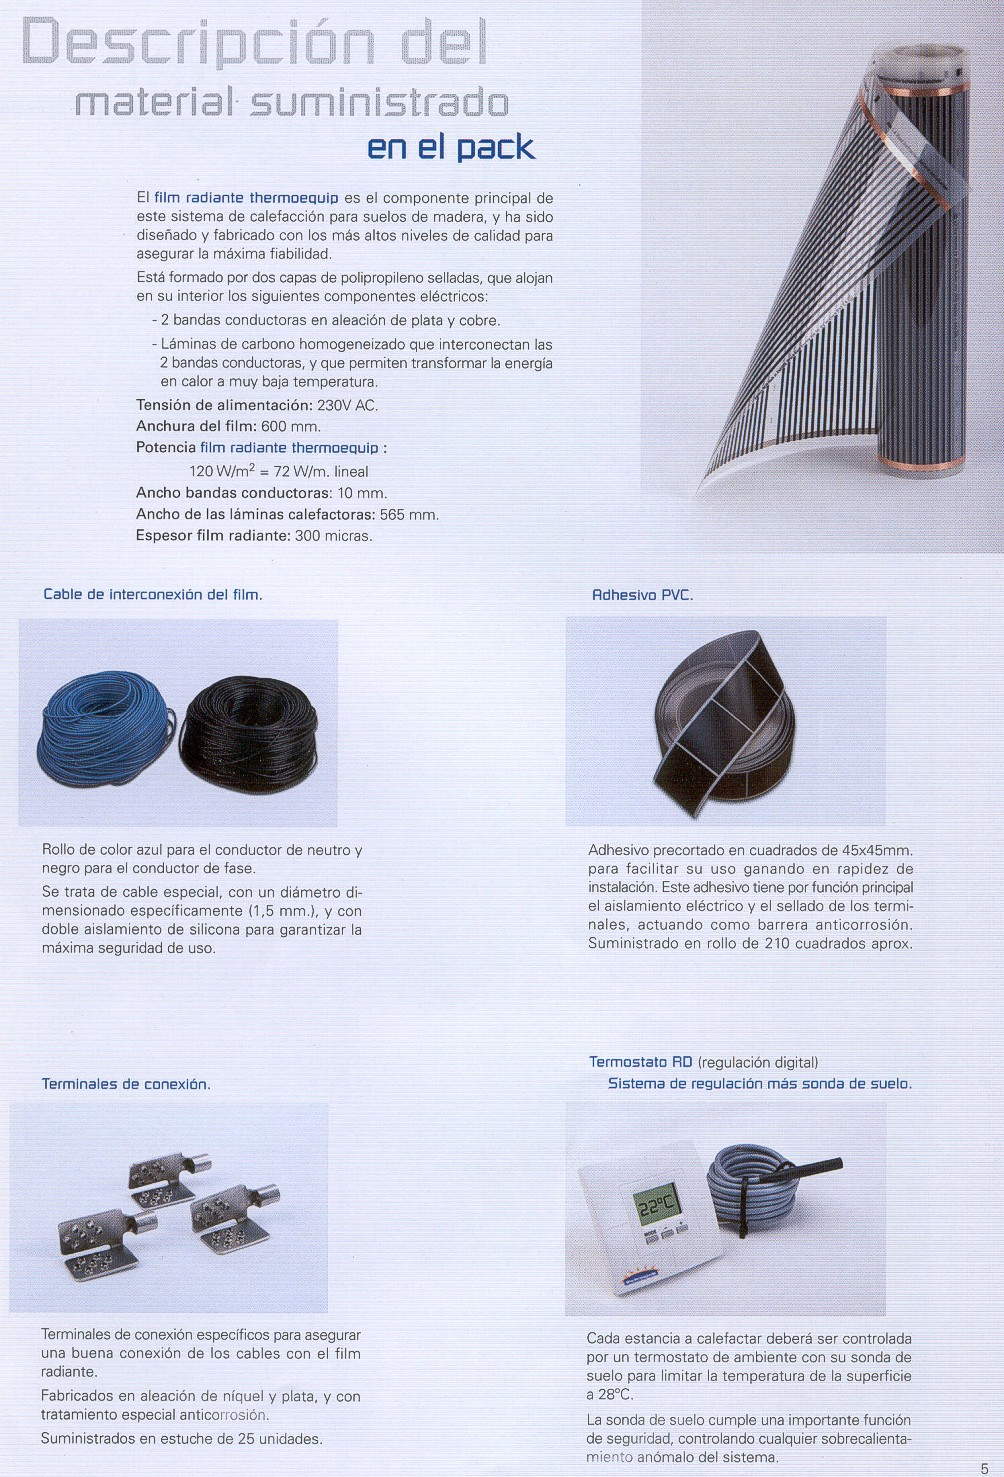 Suelo radiante thermoequip th 30 hasta 30 m2 3240 w - Precio m2 suelo radiante ...